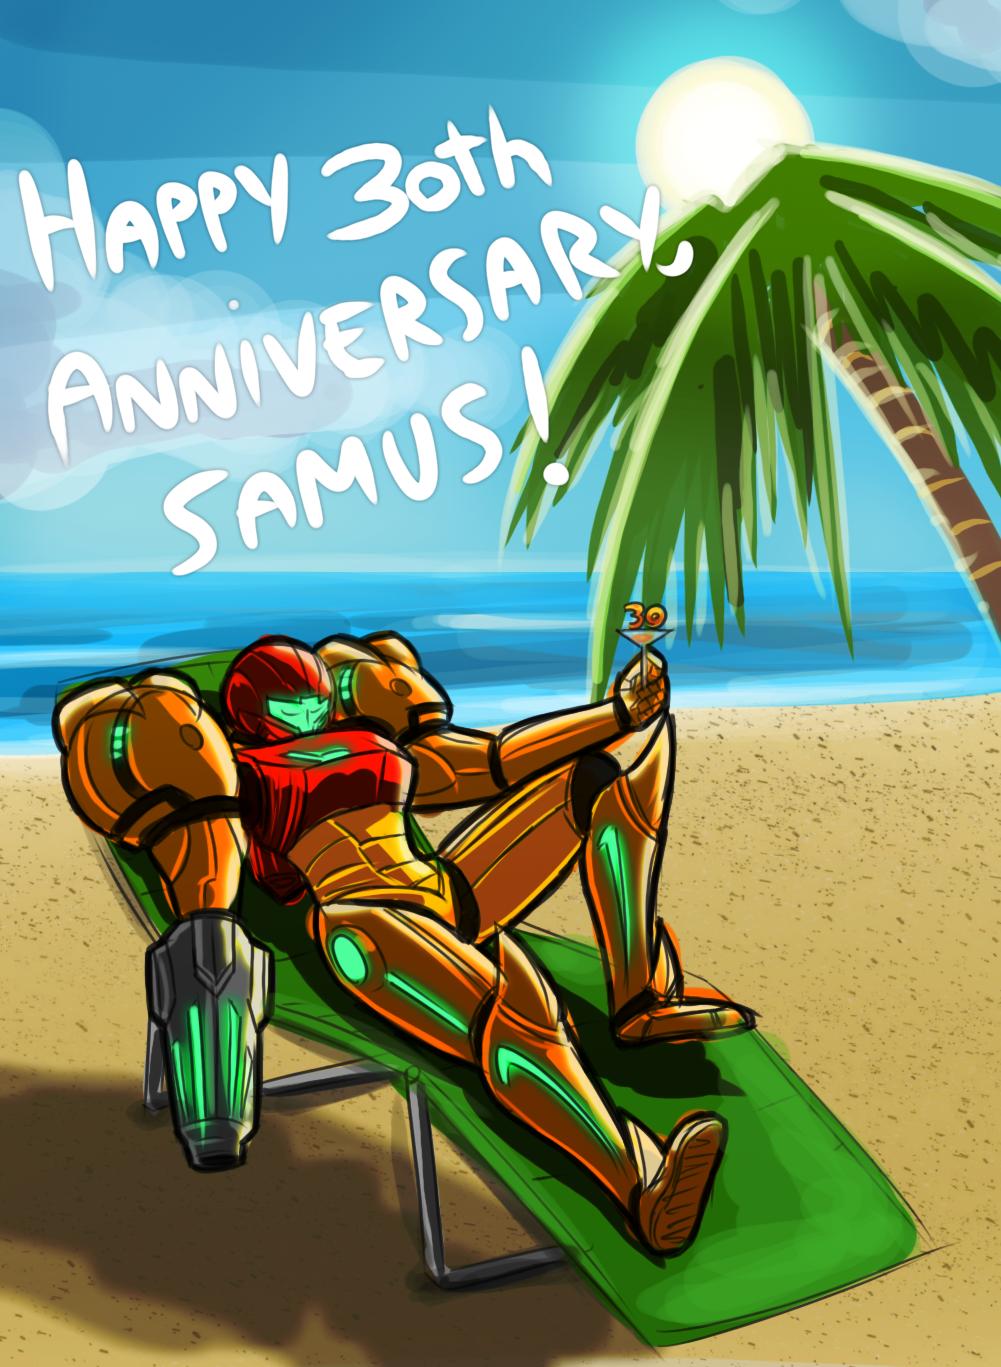 happy 30th anniversary samus metroid know your meme